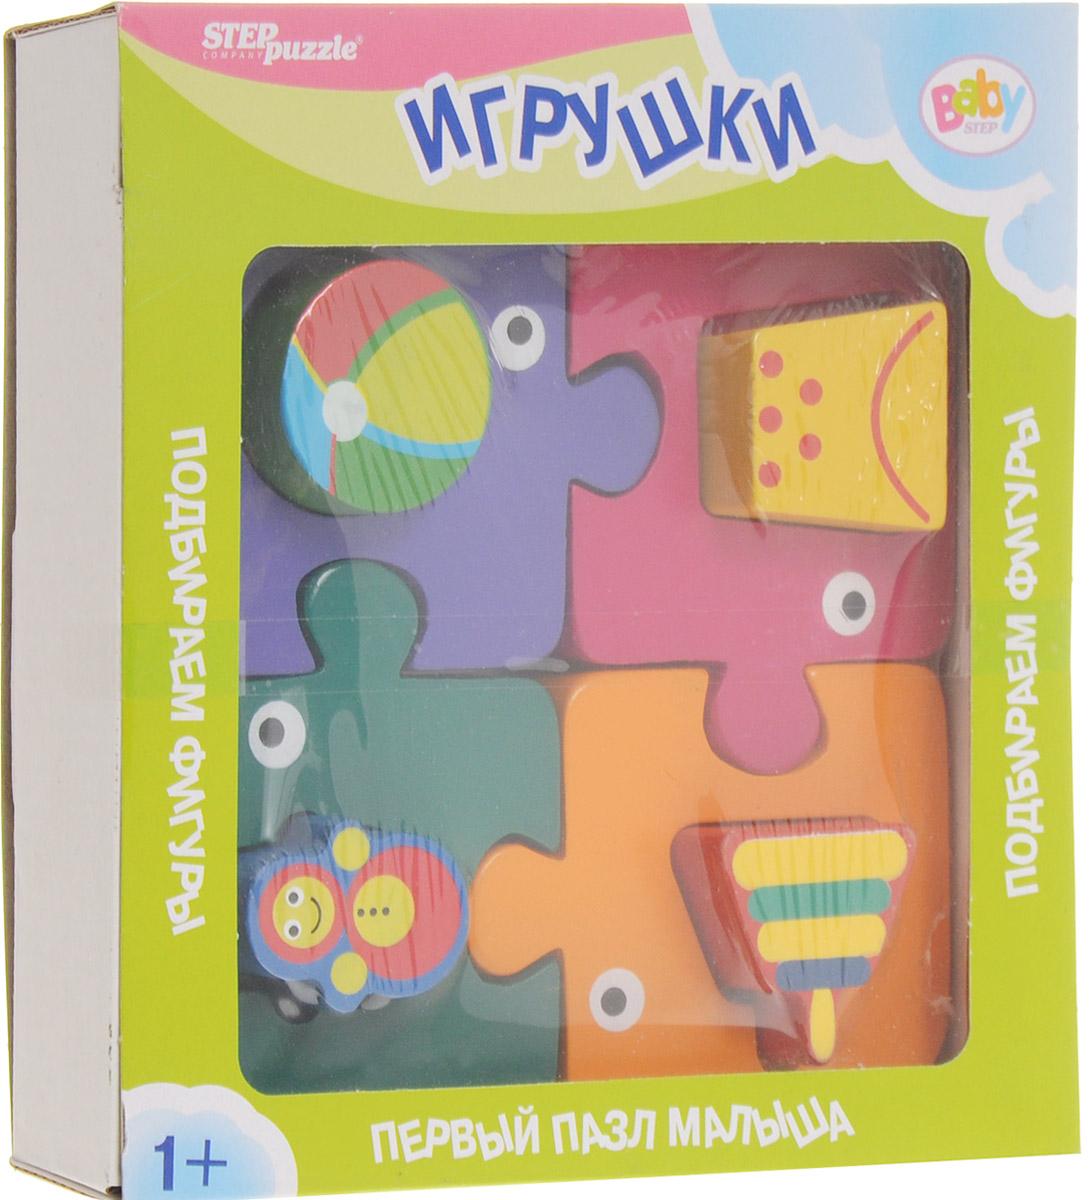 Step Puzzle Пазл для малышей Игрушки step puzzle пазл для малышей fisher price 91224